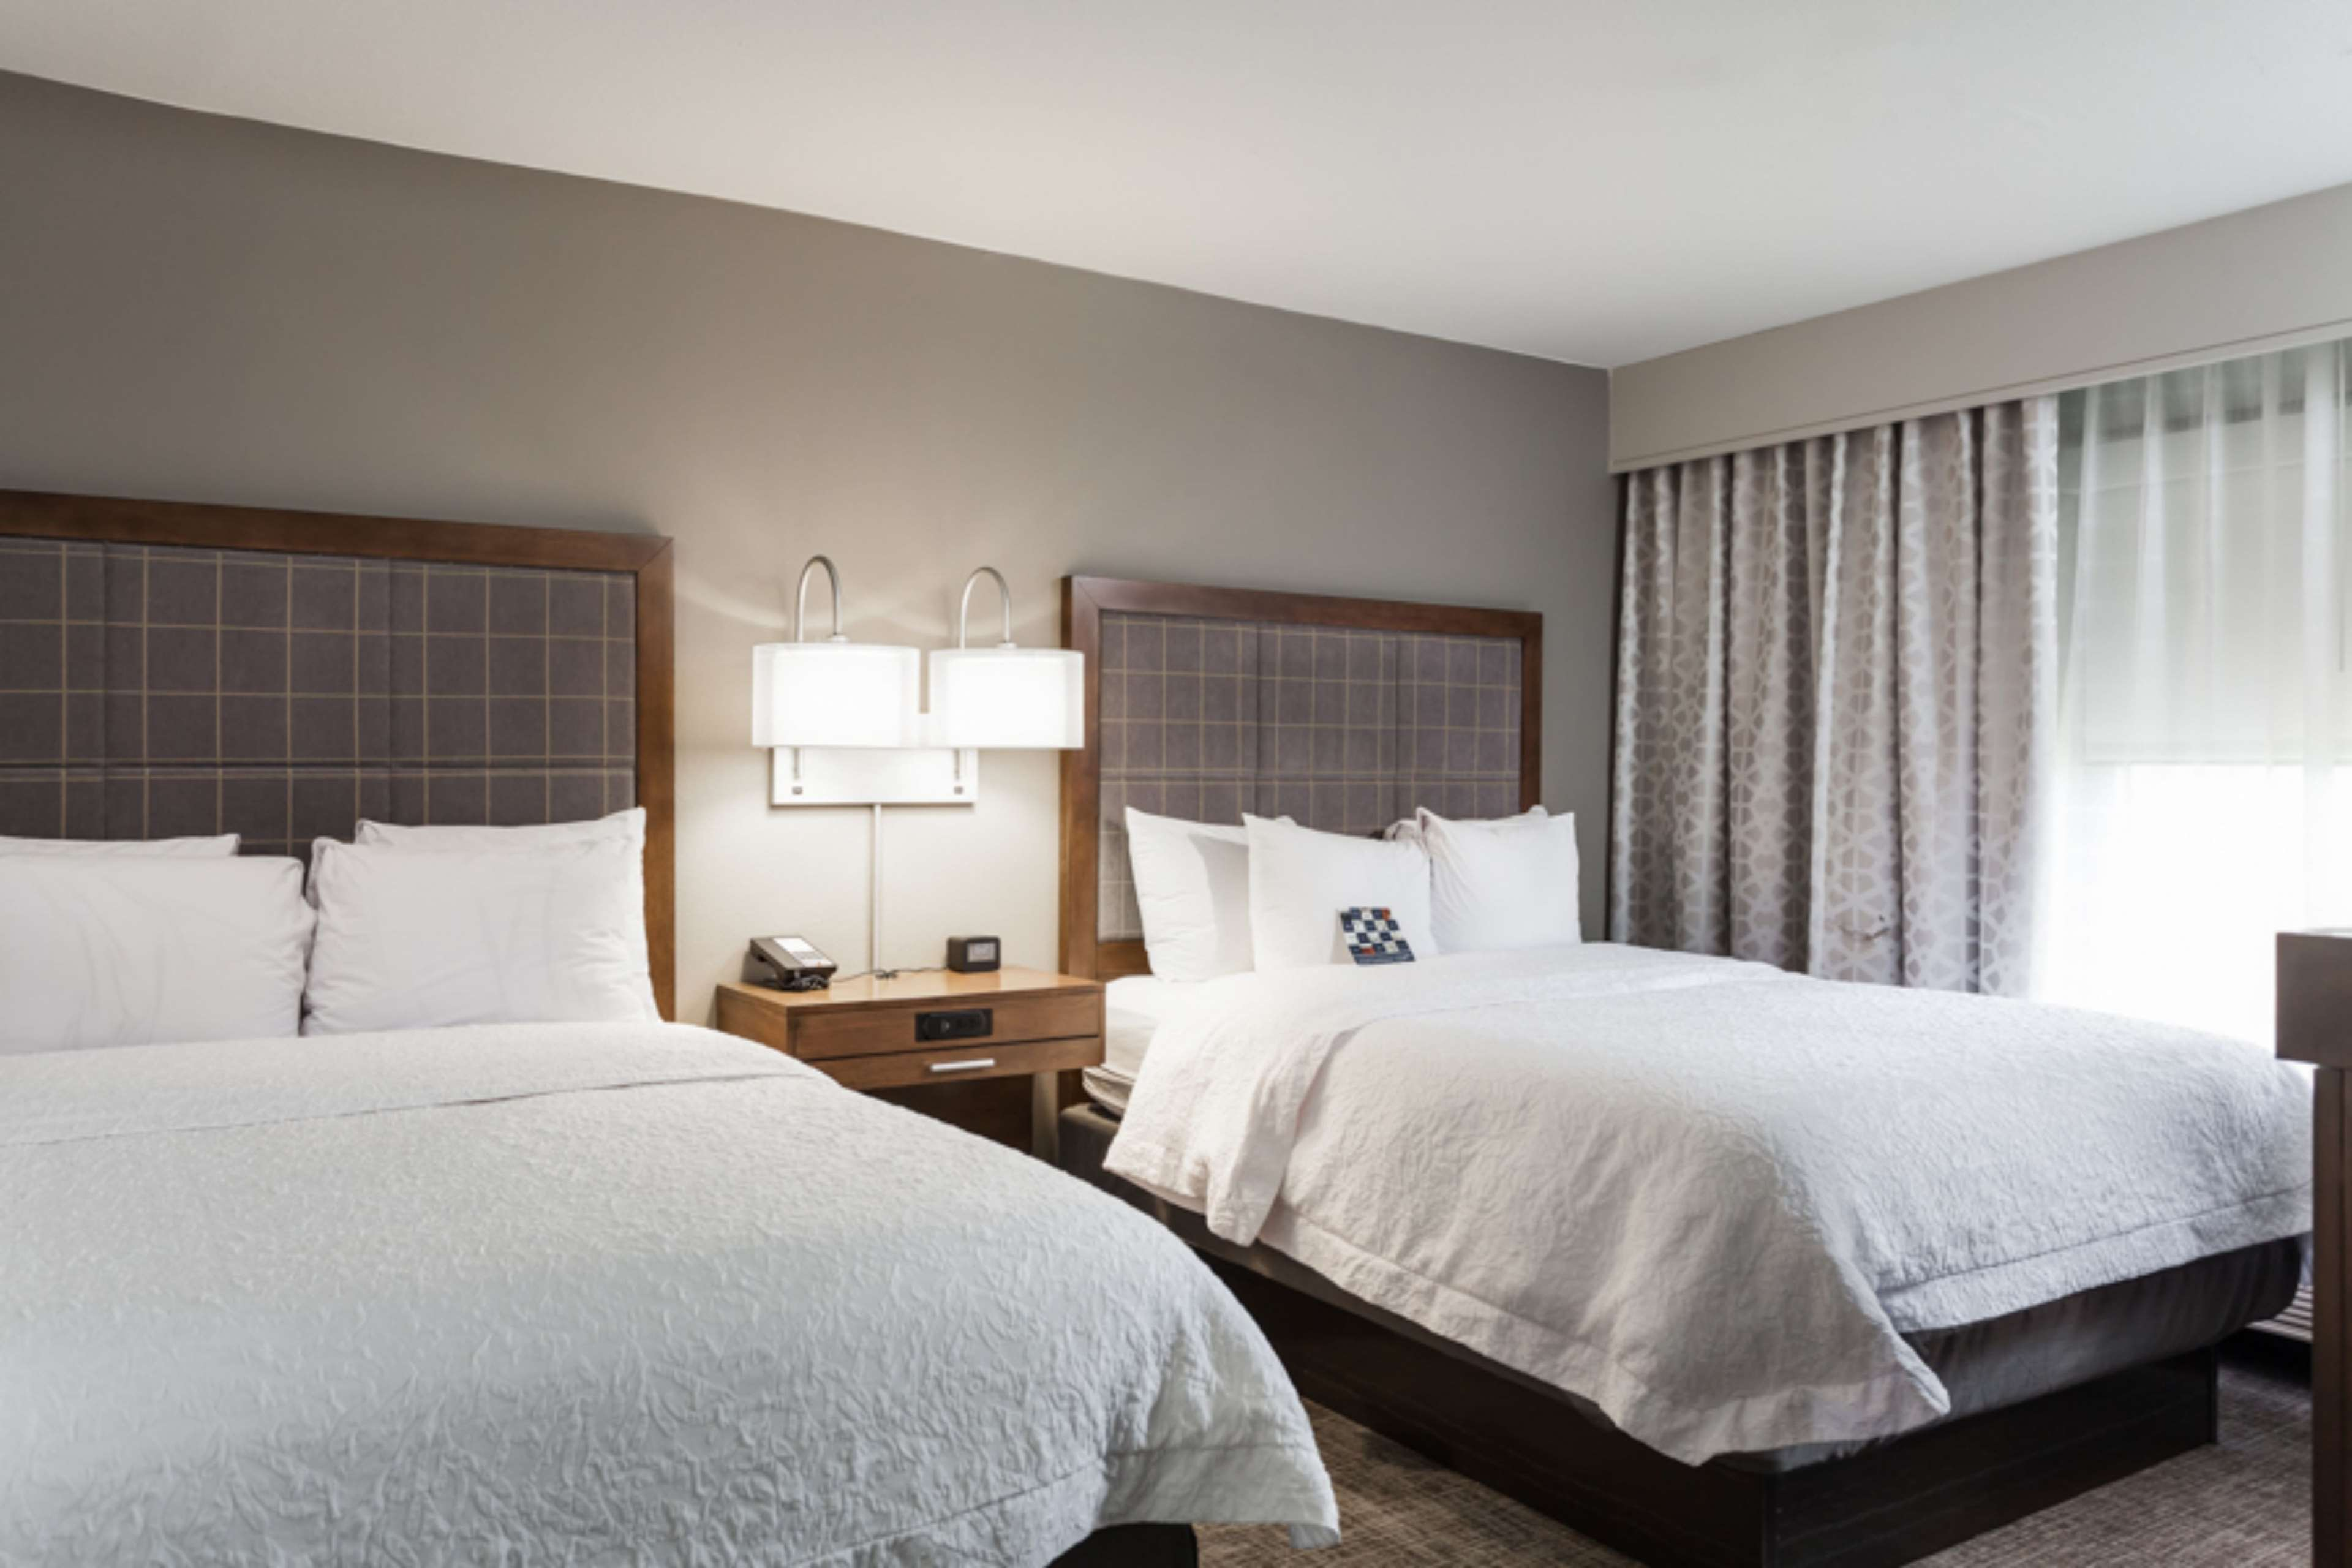 Hampton Inn & Suites Dallas-DFW Airport North-Grapevine image 15